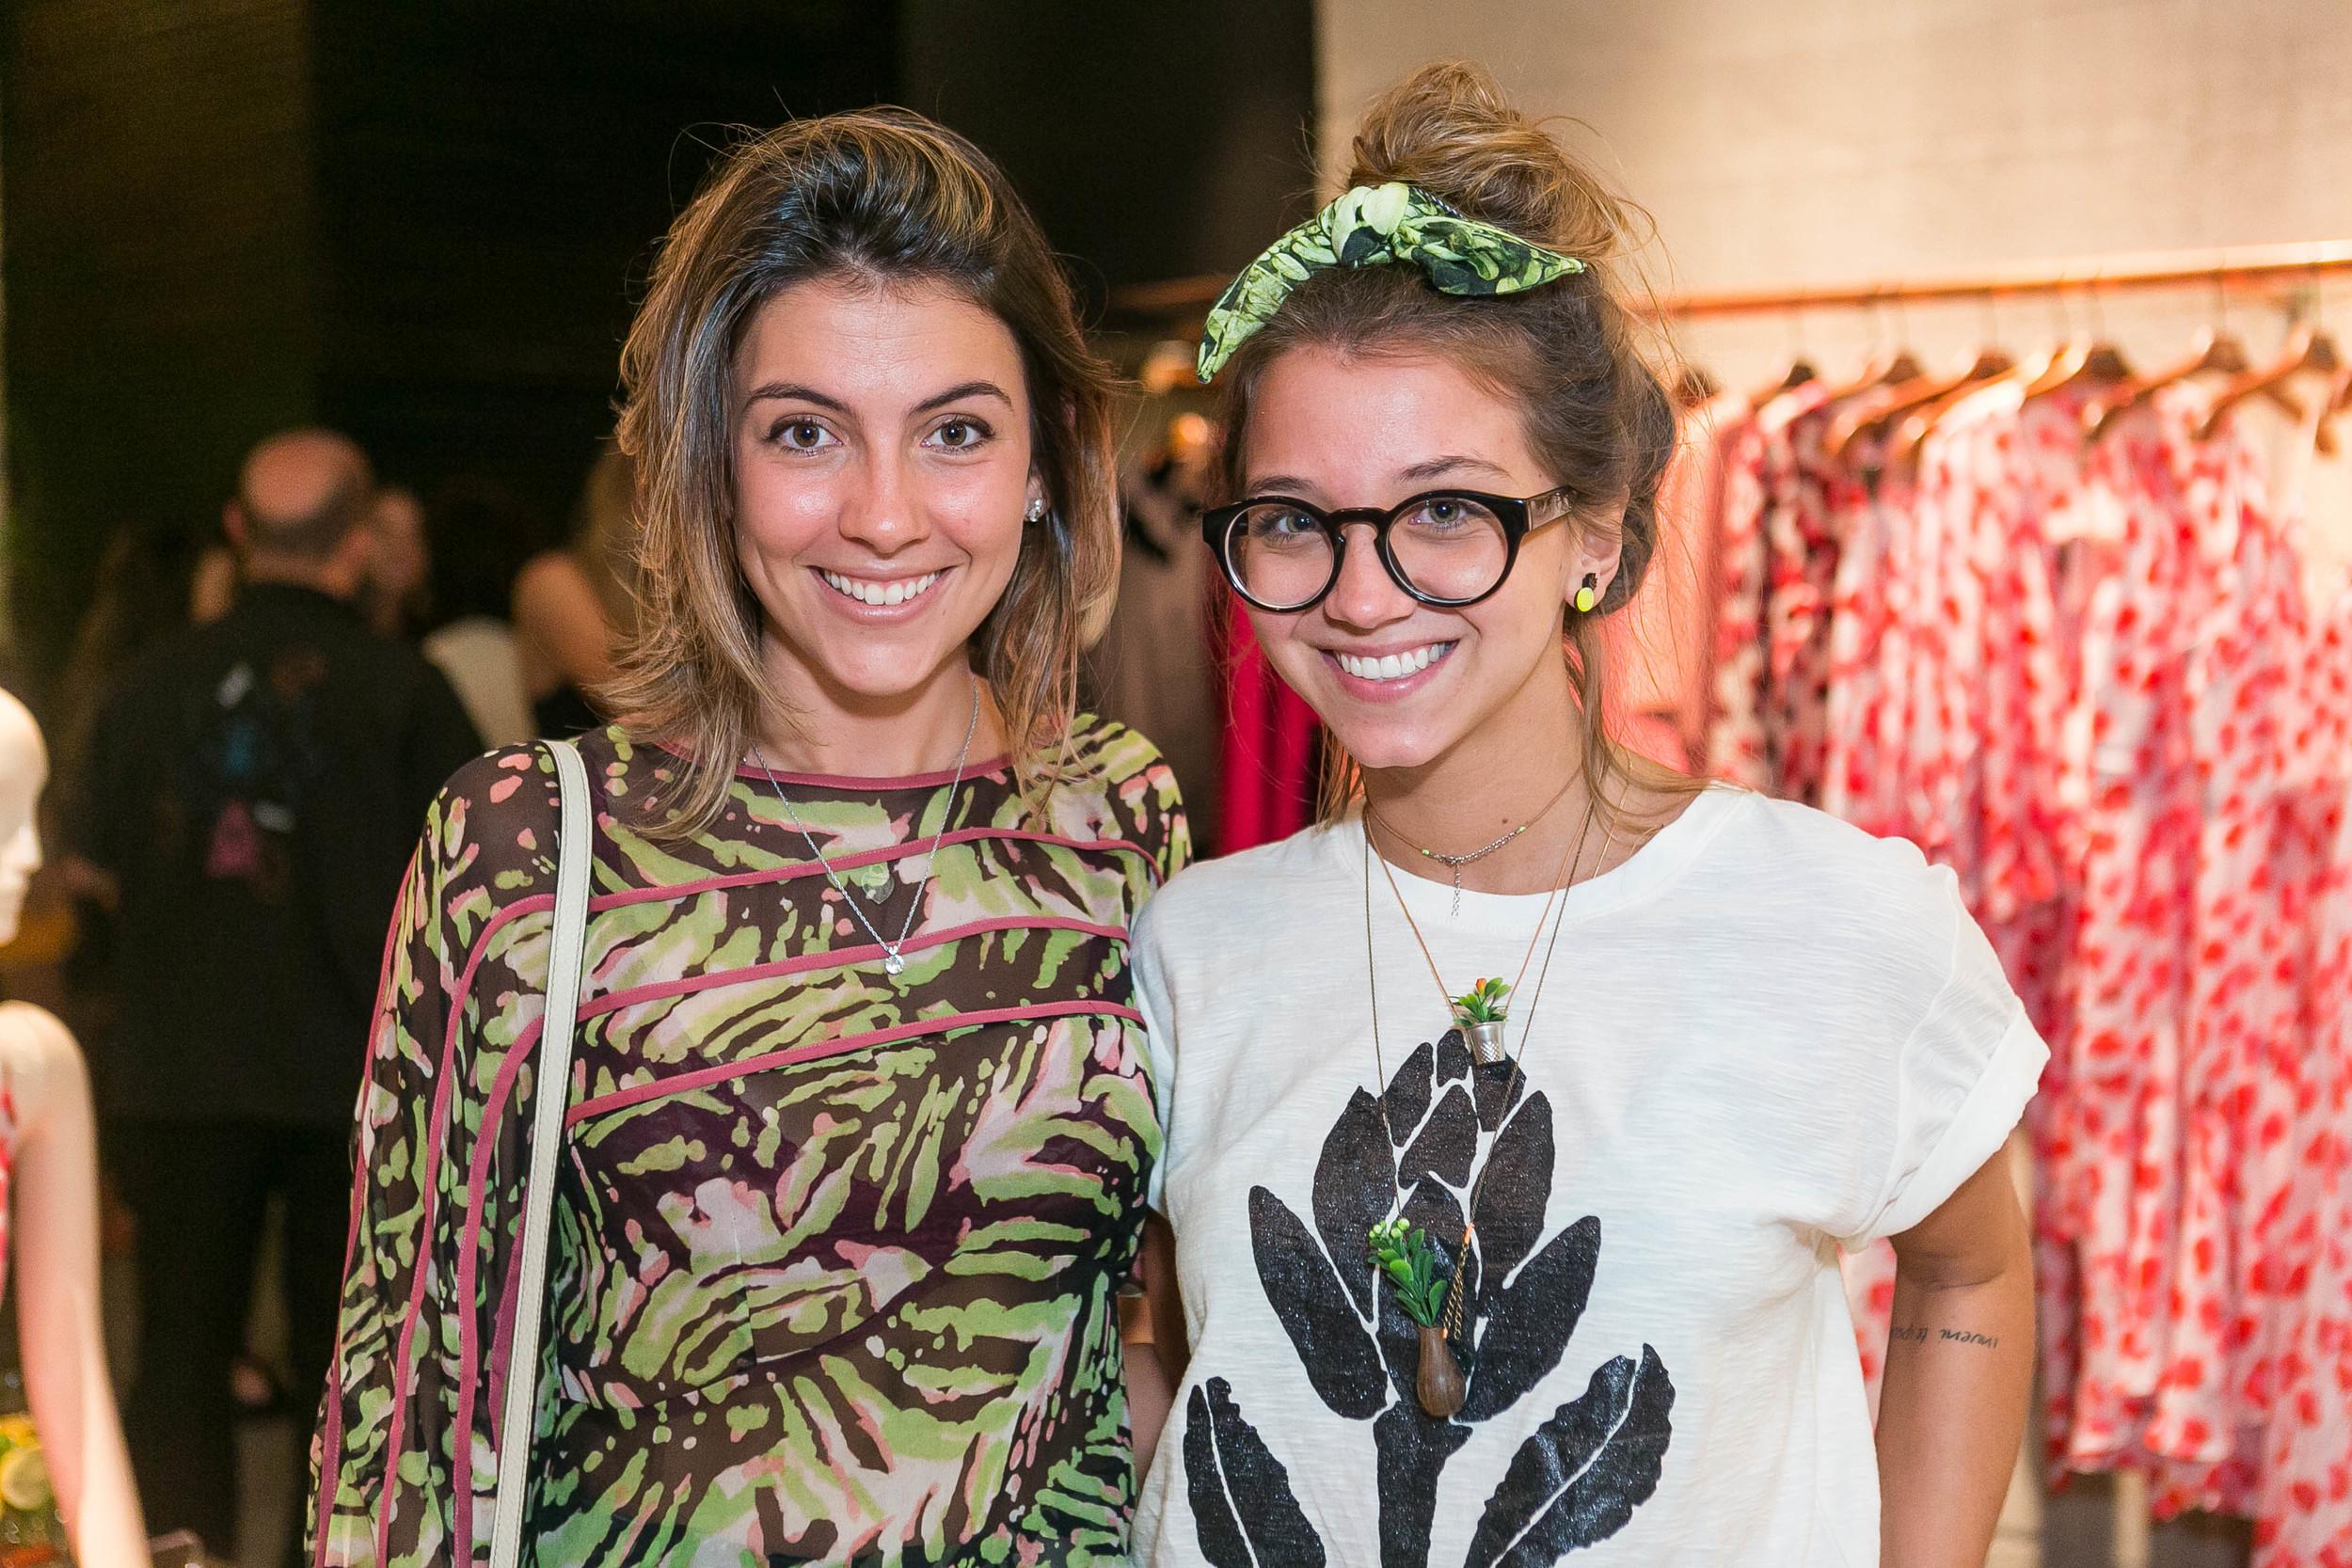 Andreza Duarte e Beatriz Ferreira-5331.jpg